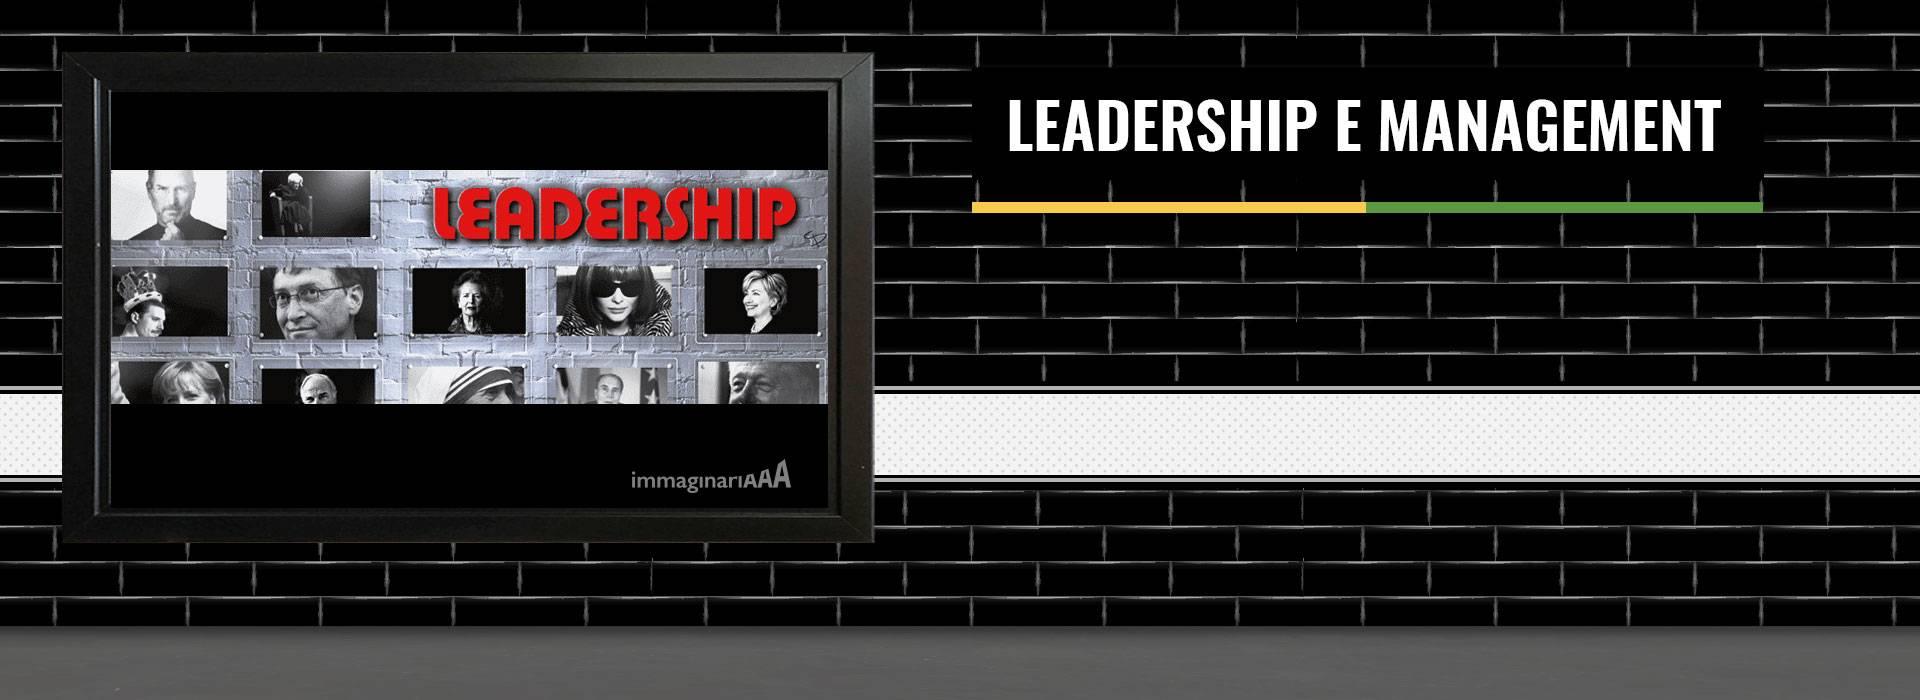 Leadership e management